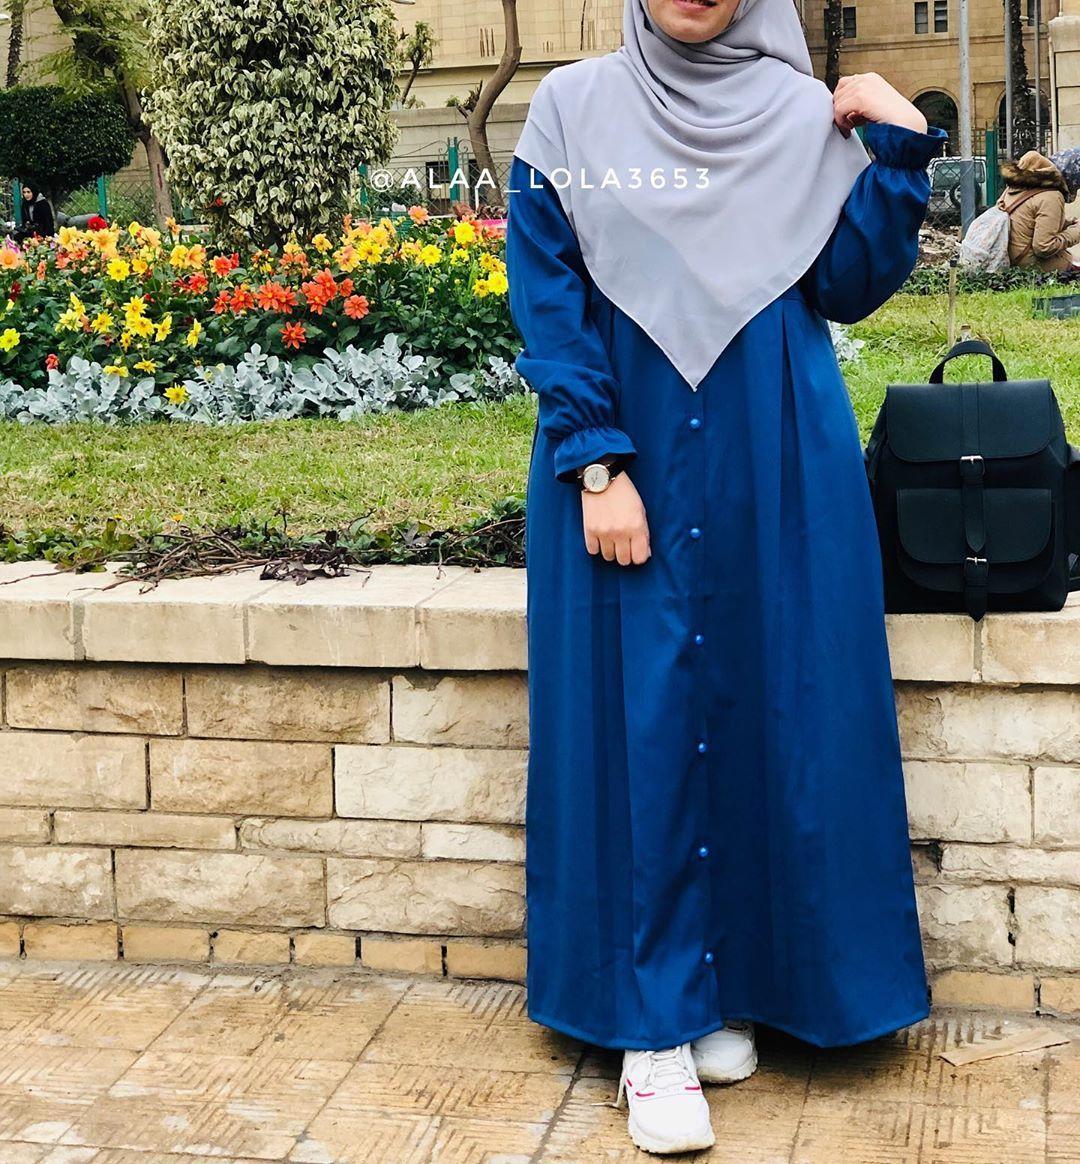 2 614 Likes 57 Comments Alaa Gamil آلاء Alaa Lola3653 On Instagram يتعافى المر Muslim Fashion Hijab Muslim Fashion Dress Muslim Fashion Outfits